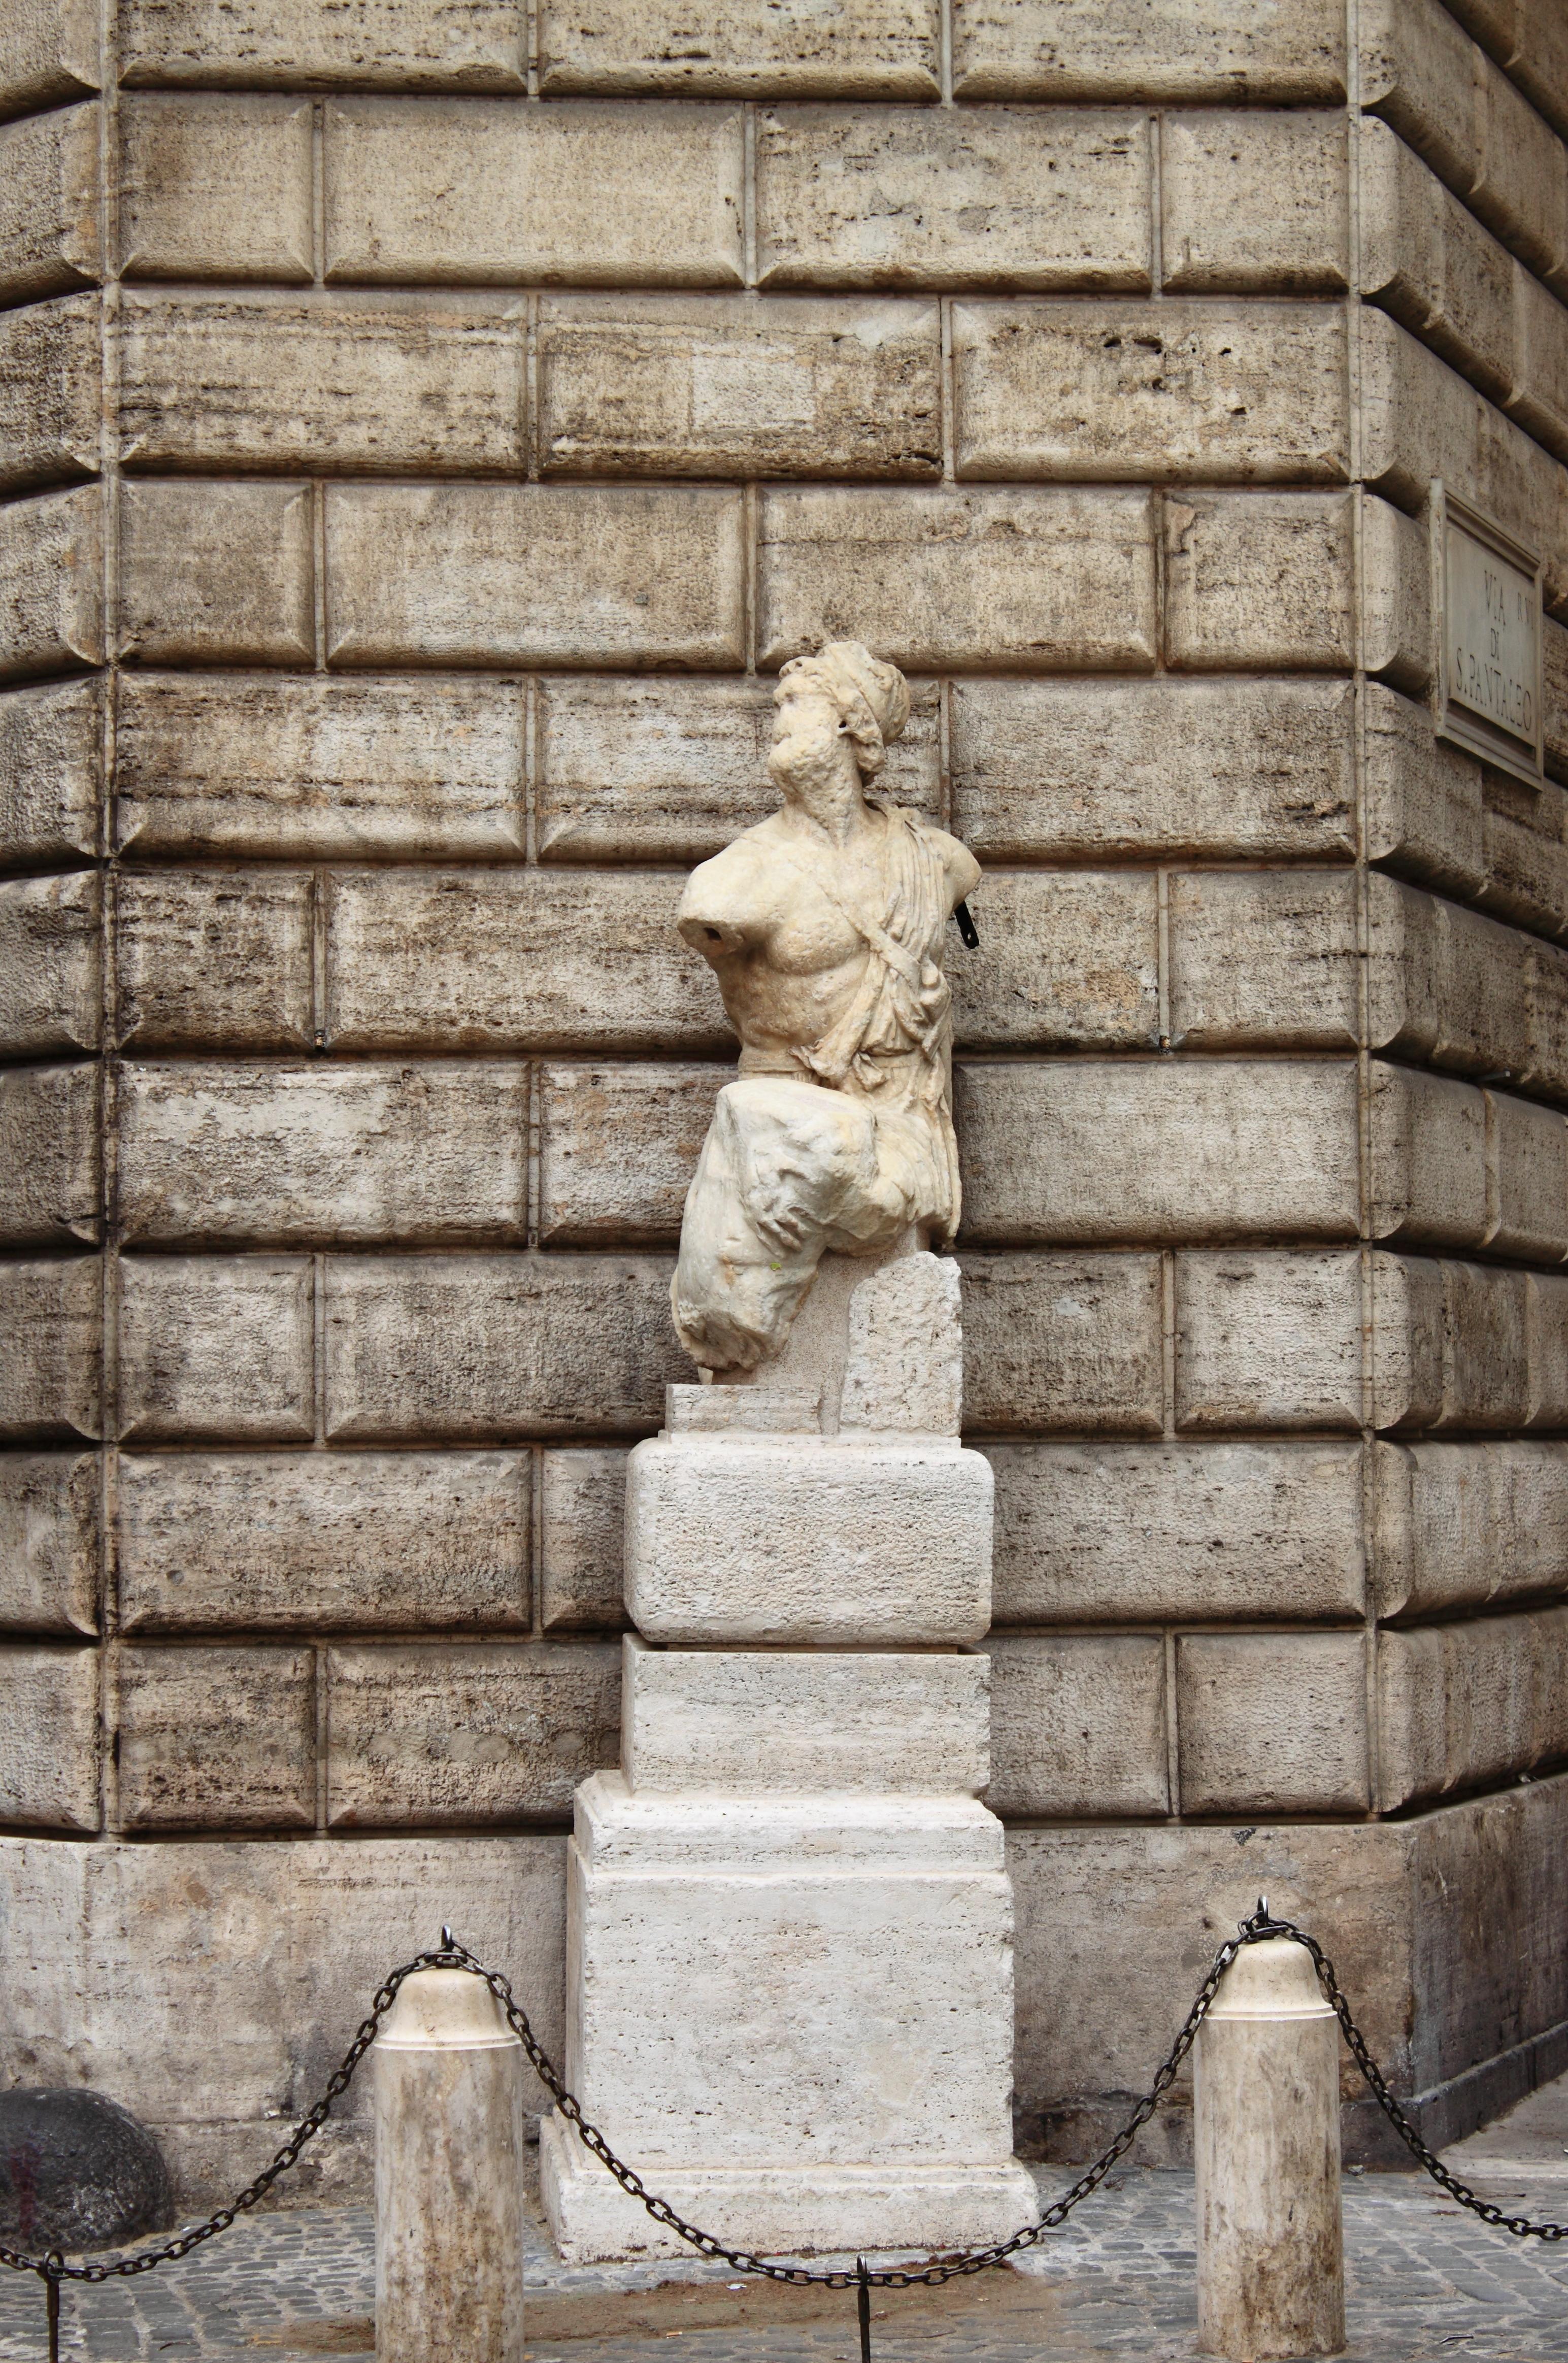 En Roma hablan hasta las estatuas - Italia Circuito Descubre Italia